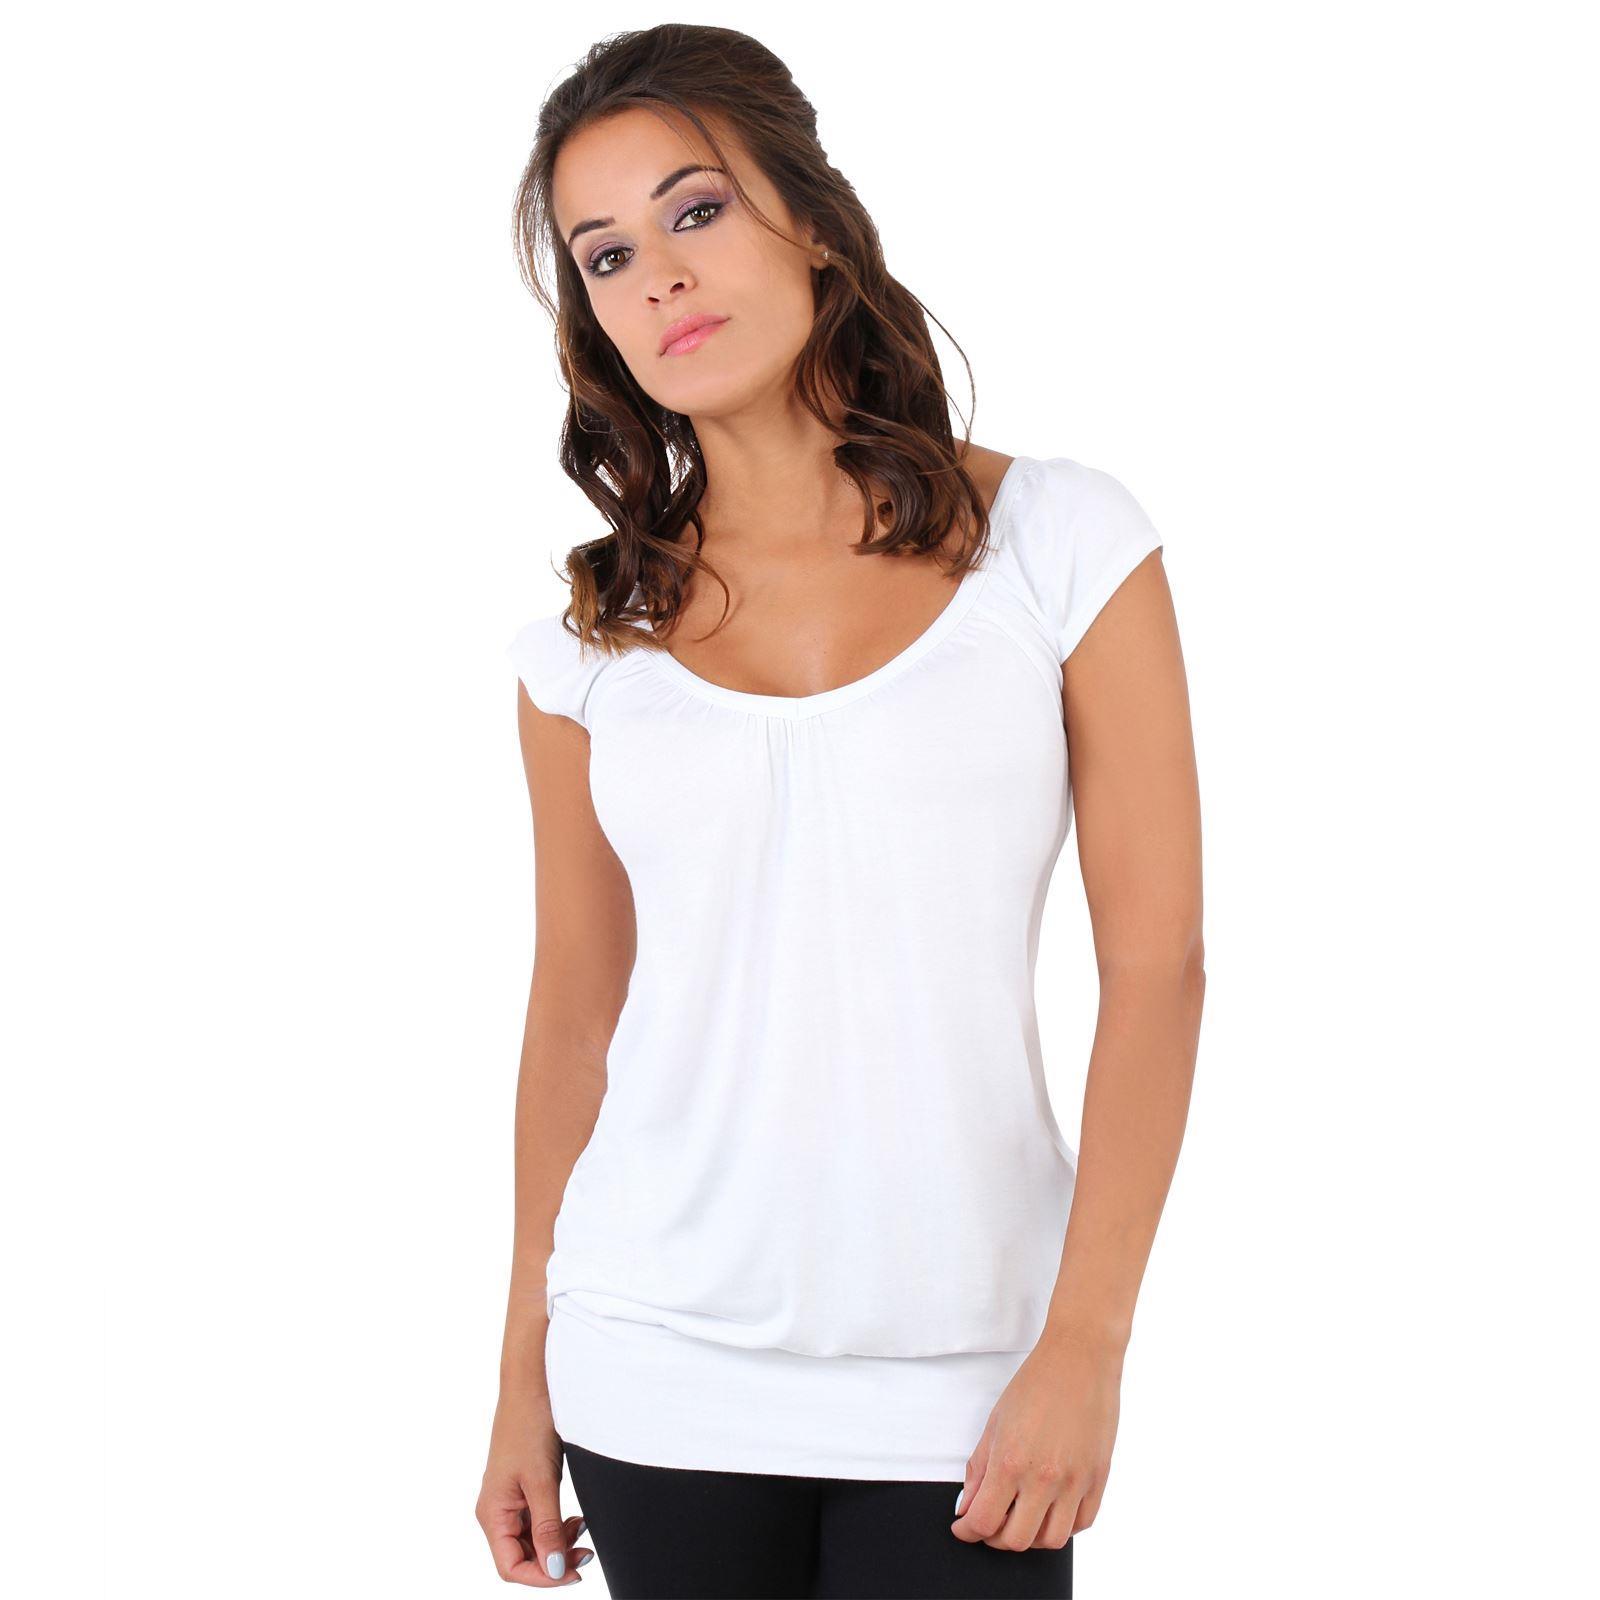 Womens-Ladies-Plain-T-Shirt-Short-Sleeve-Long-Loose-V-Neck-Blouse-Tunic-Top thumbnail 61